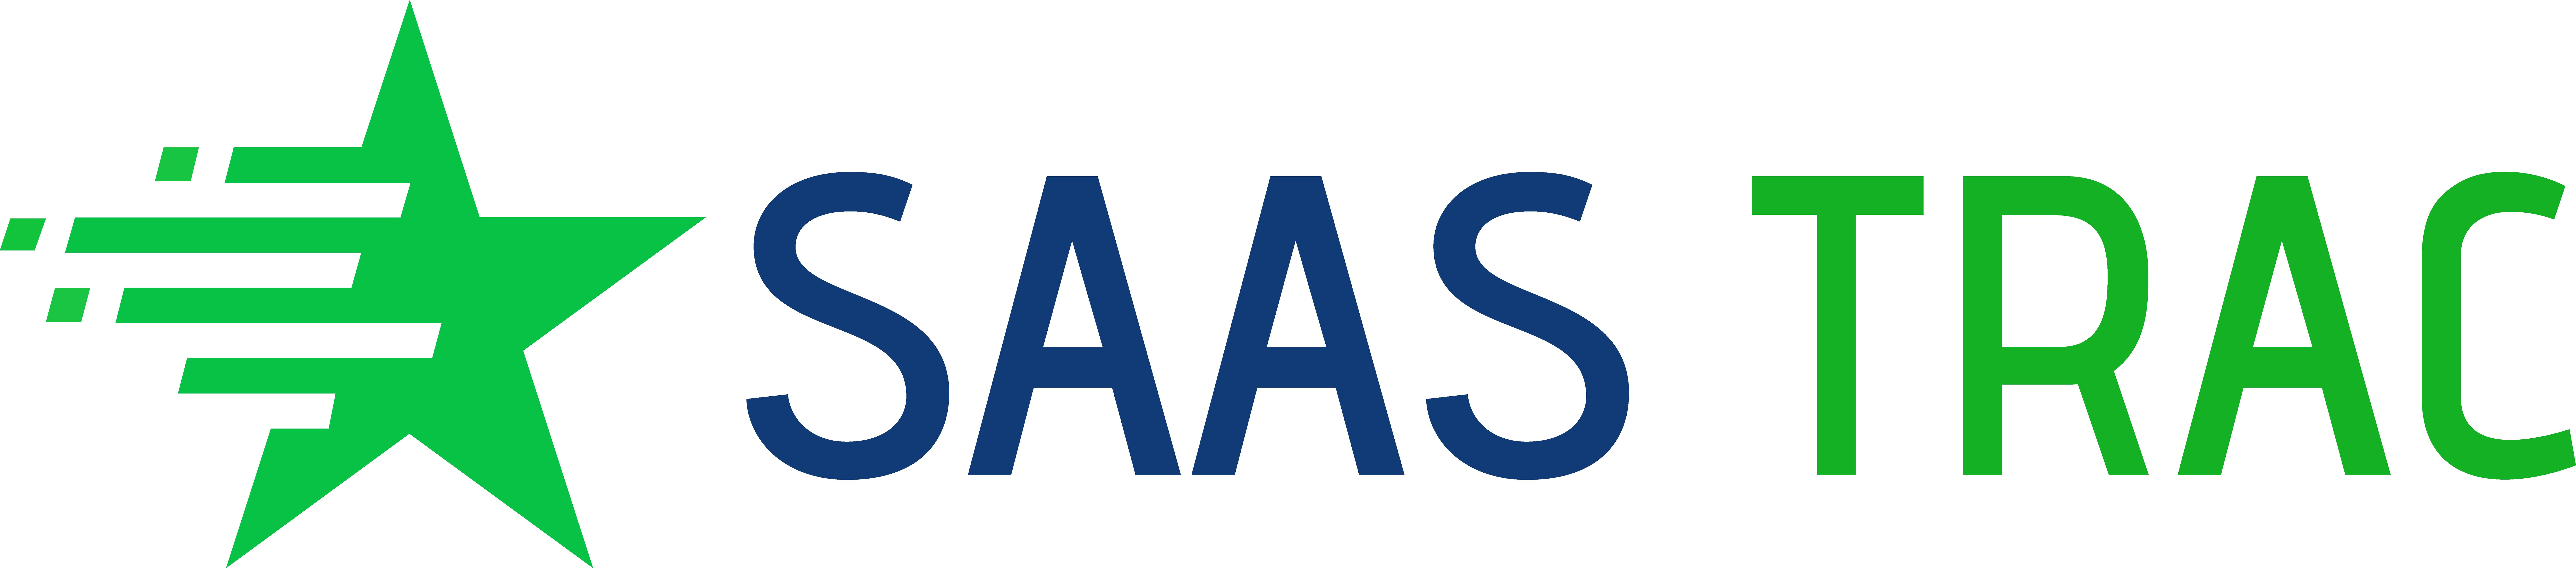 Saastrac_inline logo